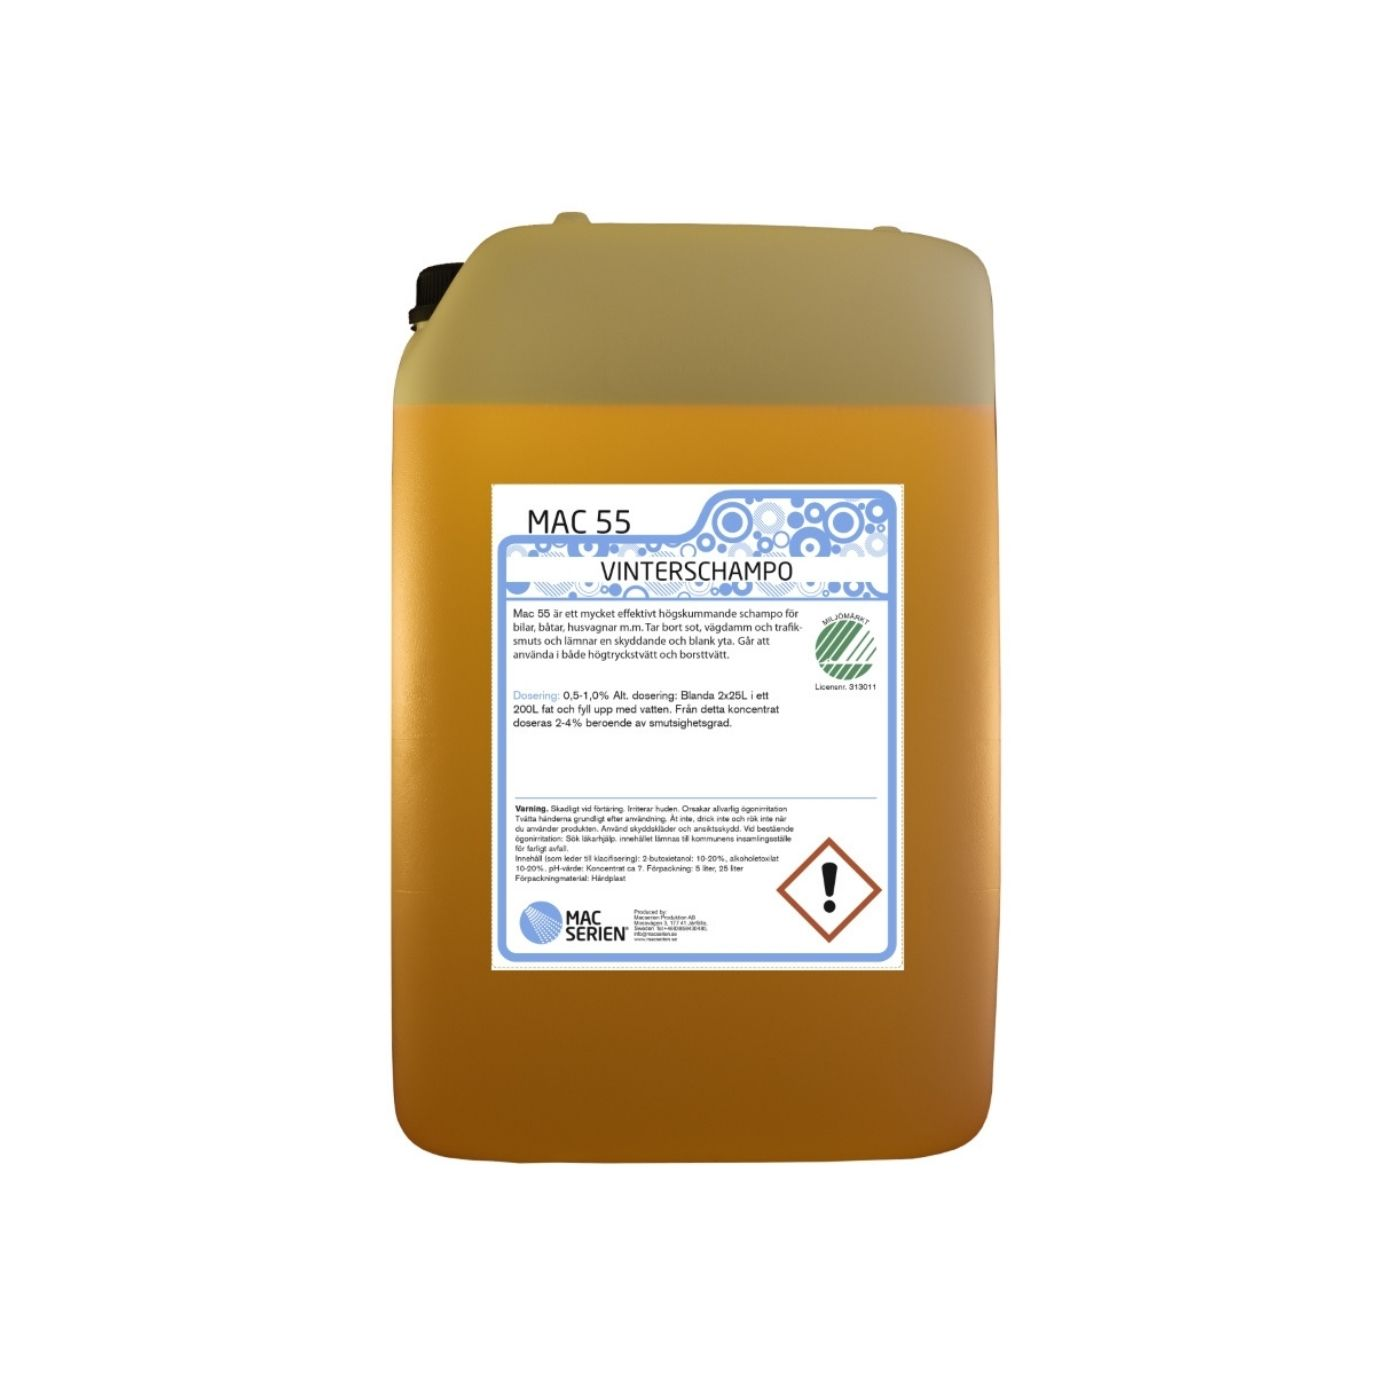 Bilschampo Mac 55 Vinterschampo, 25000 ml